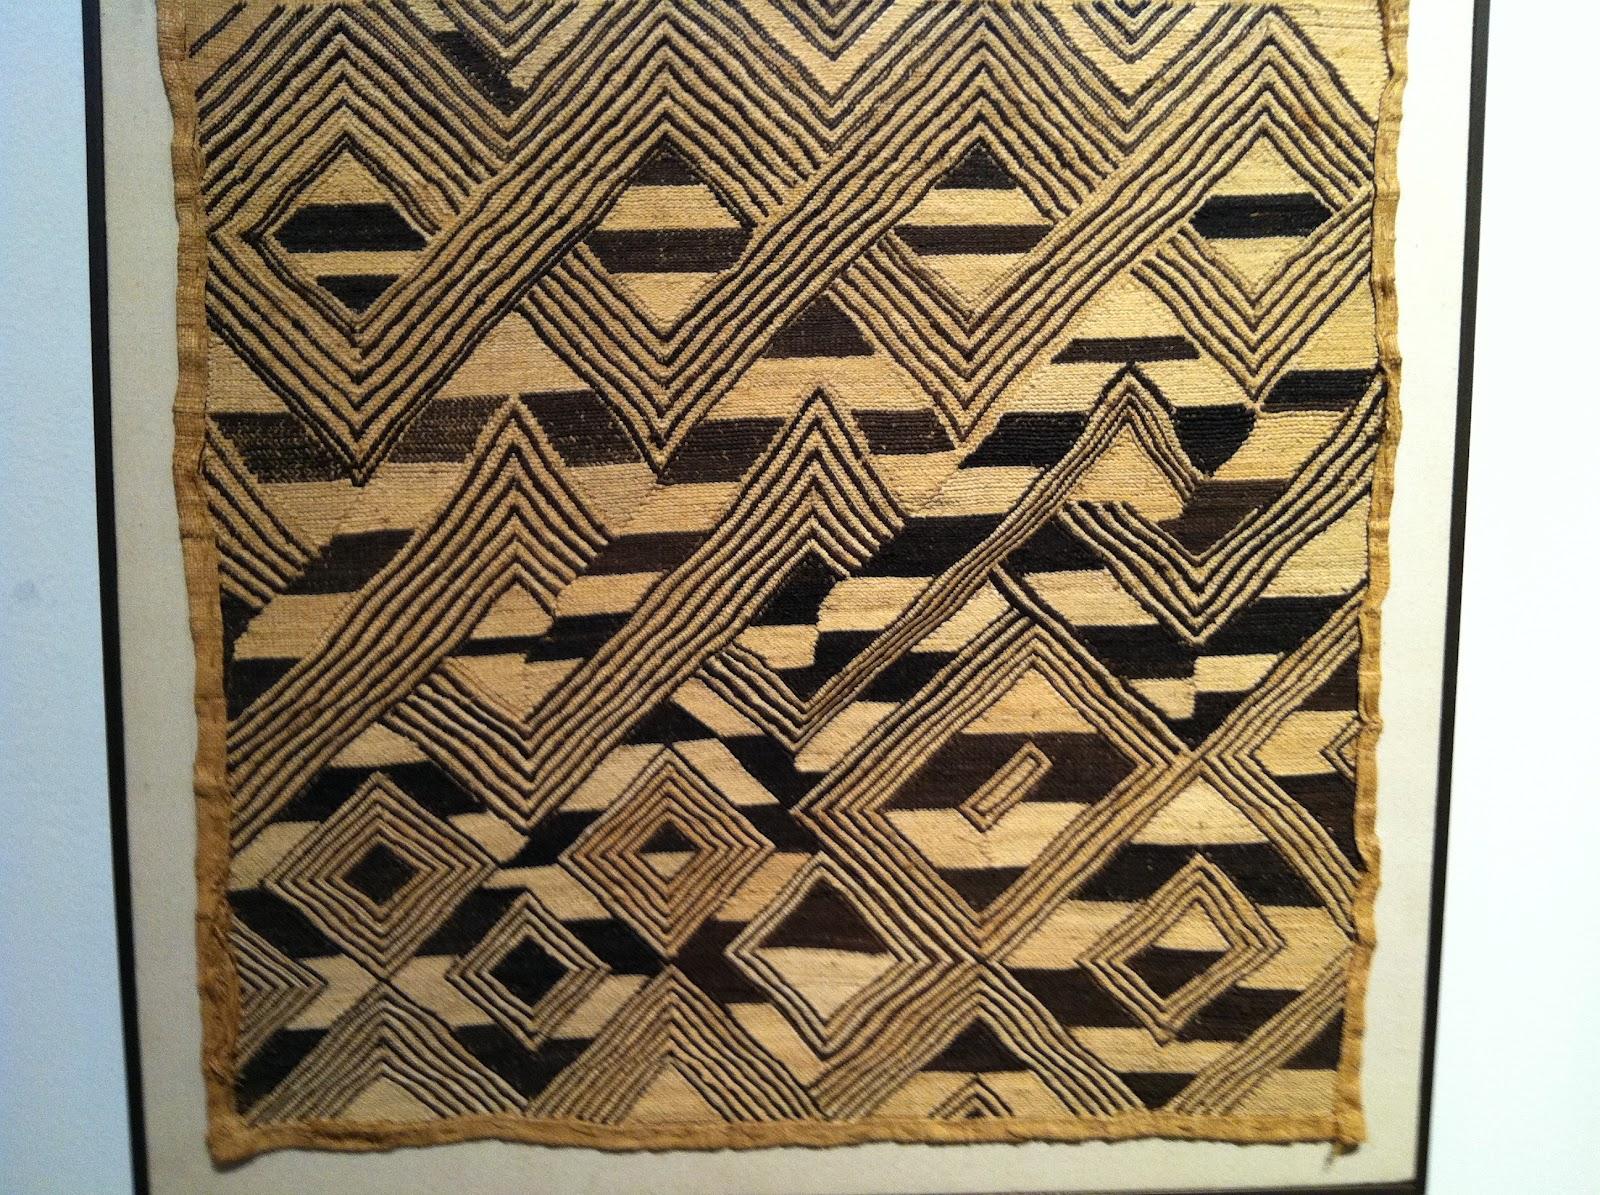 African Art Geometric Designs